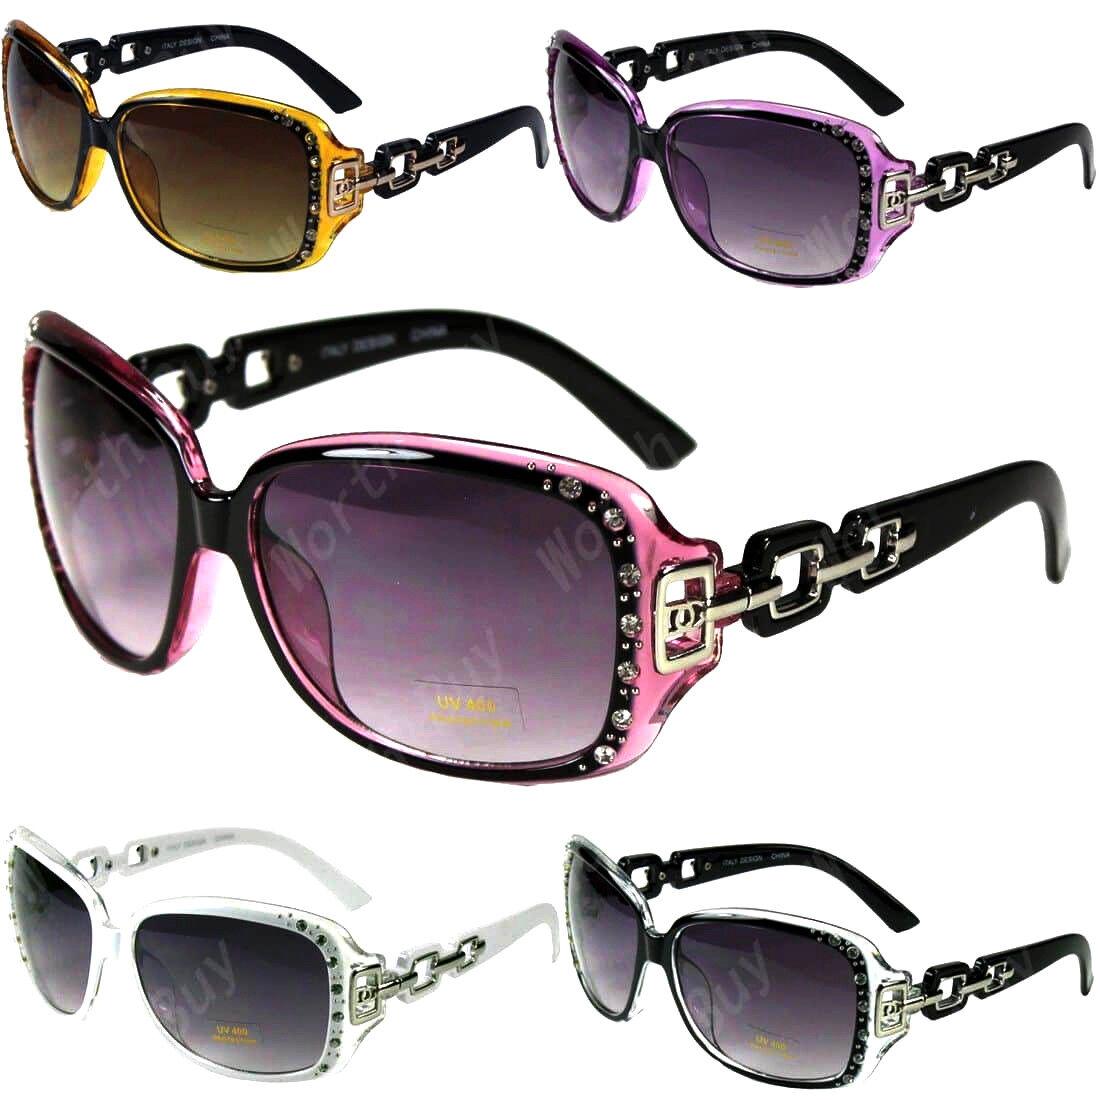 New DG Eyewear Womens Rhinestones Square Wrap Sunglasses Des